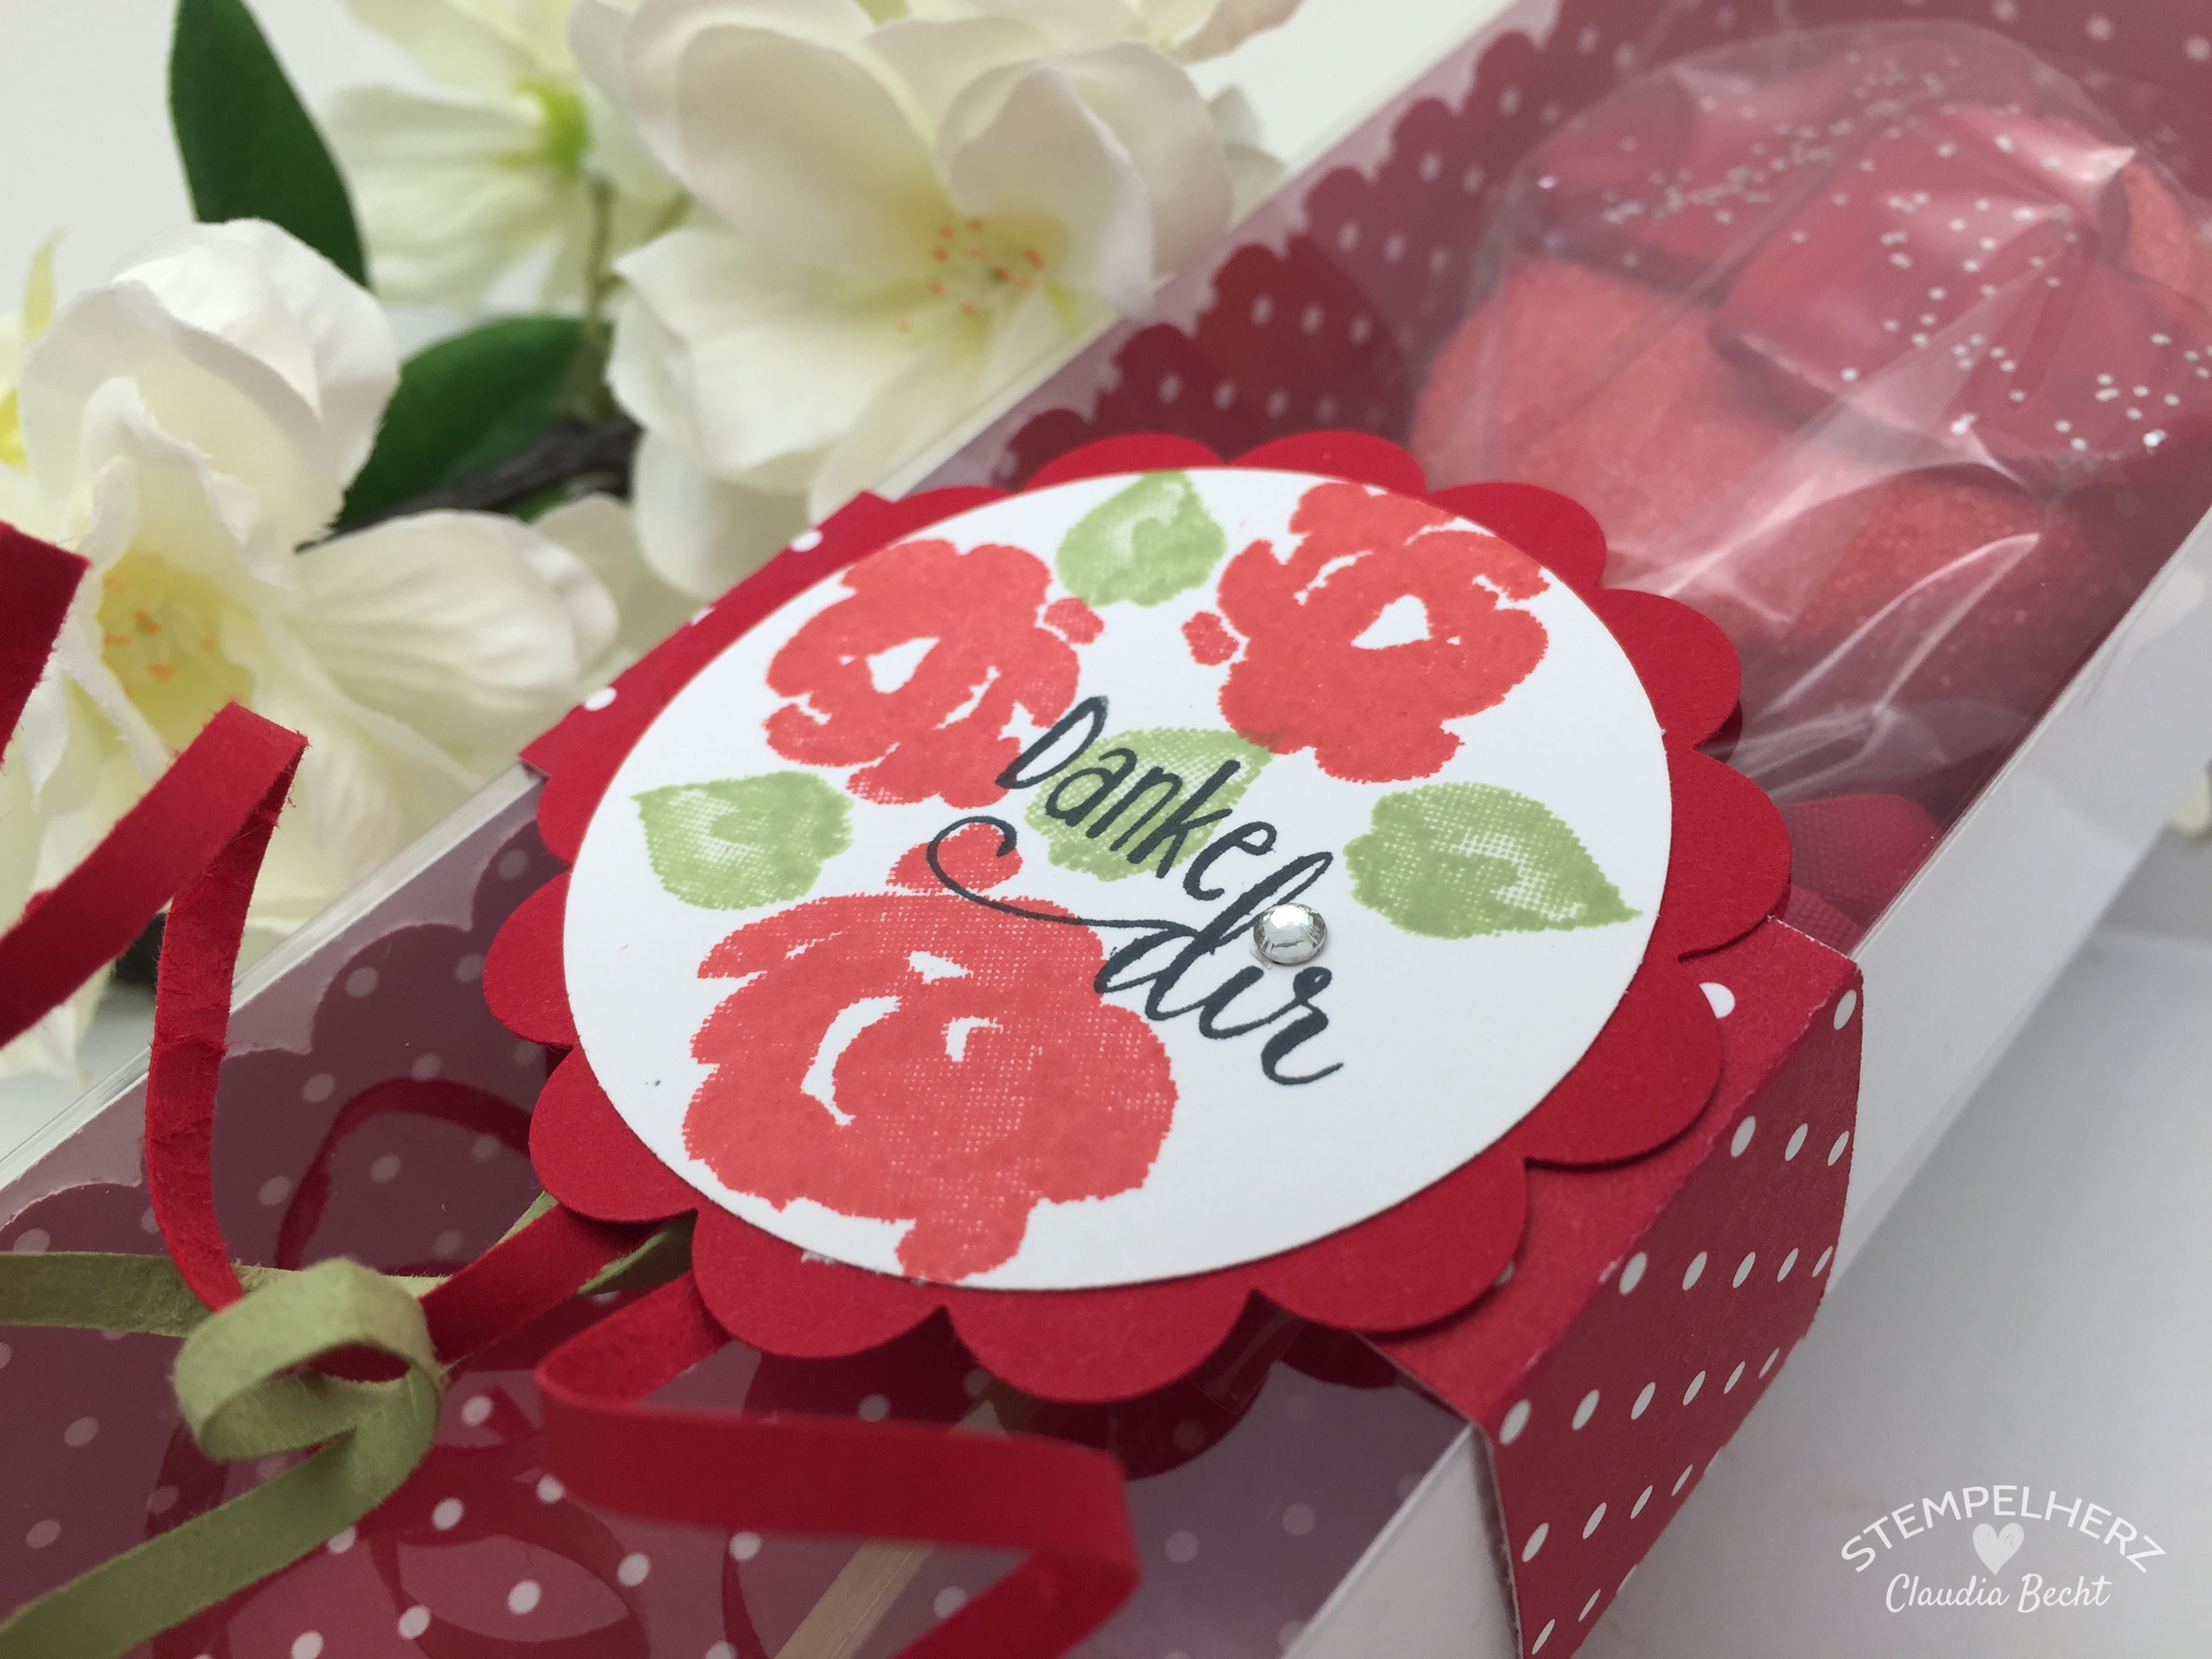 Stampin Up-Stempelherz-Verpackung-Box-Verpackung Cake Pop-Muttertag-Painted Petals-Cake Pop Verpackung Danke Dir zum Muttertag 05